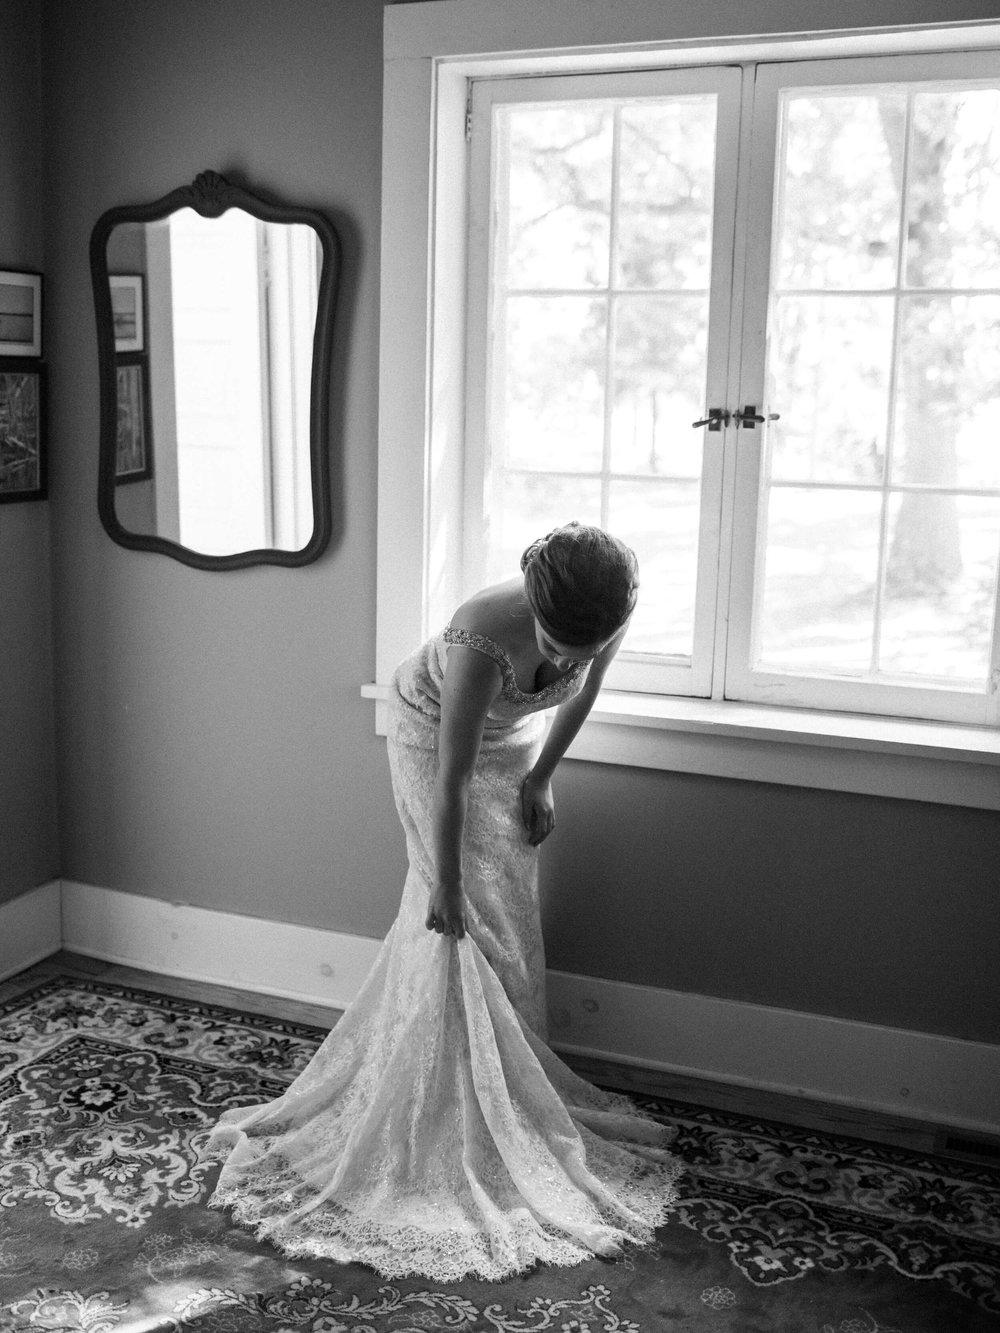 rochelle-louise-photography-acowsay-cinema-wisconsin-wedding-19.jpg